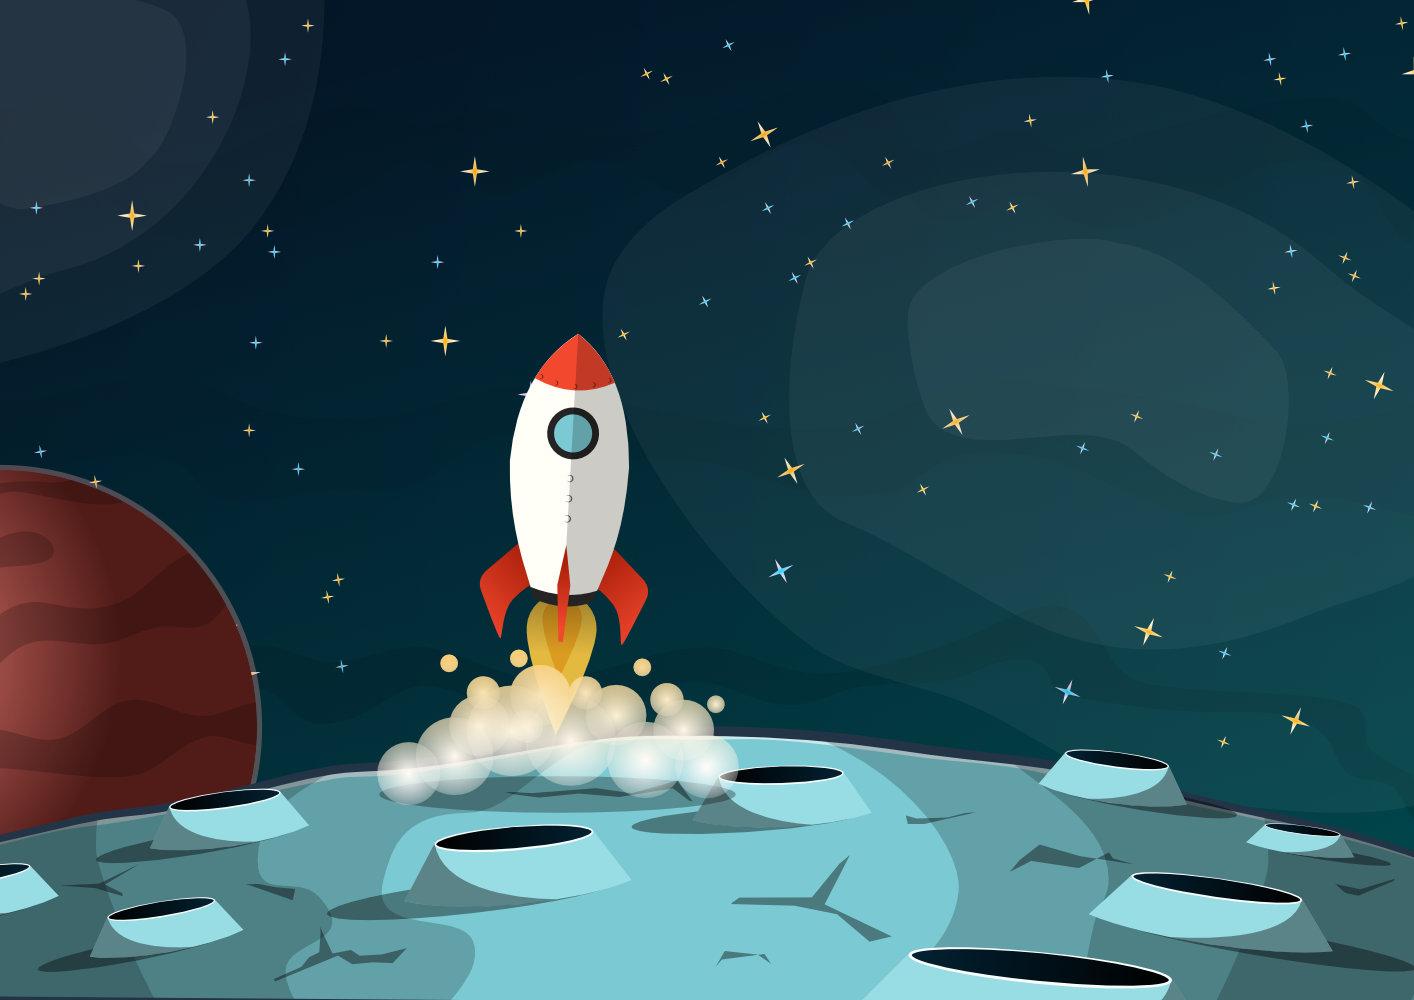 Cartoon space scene